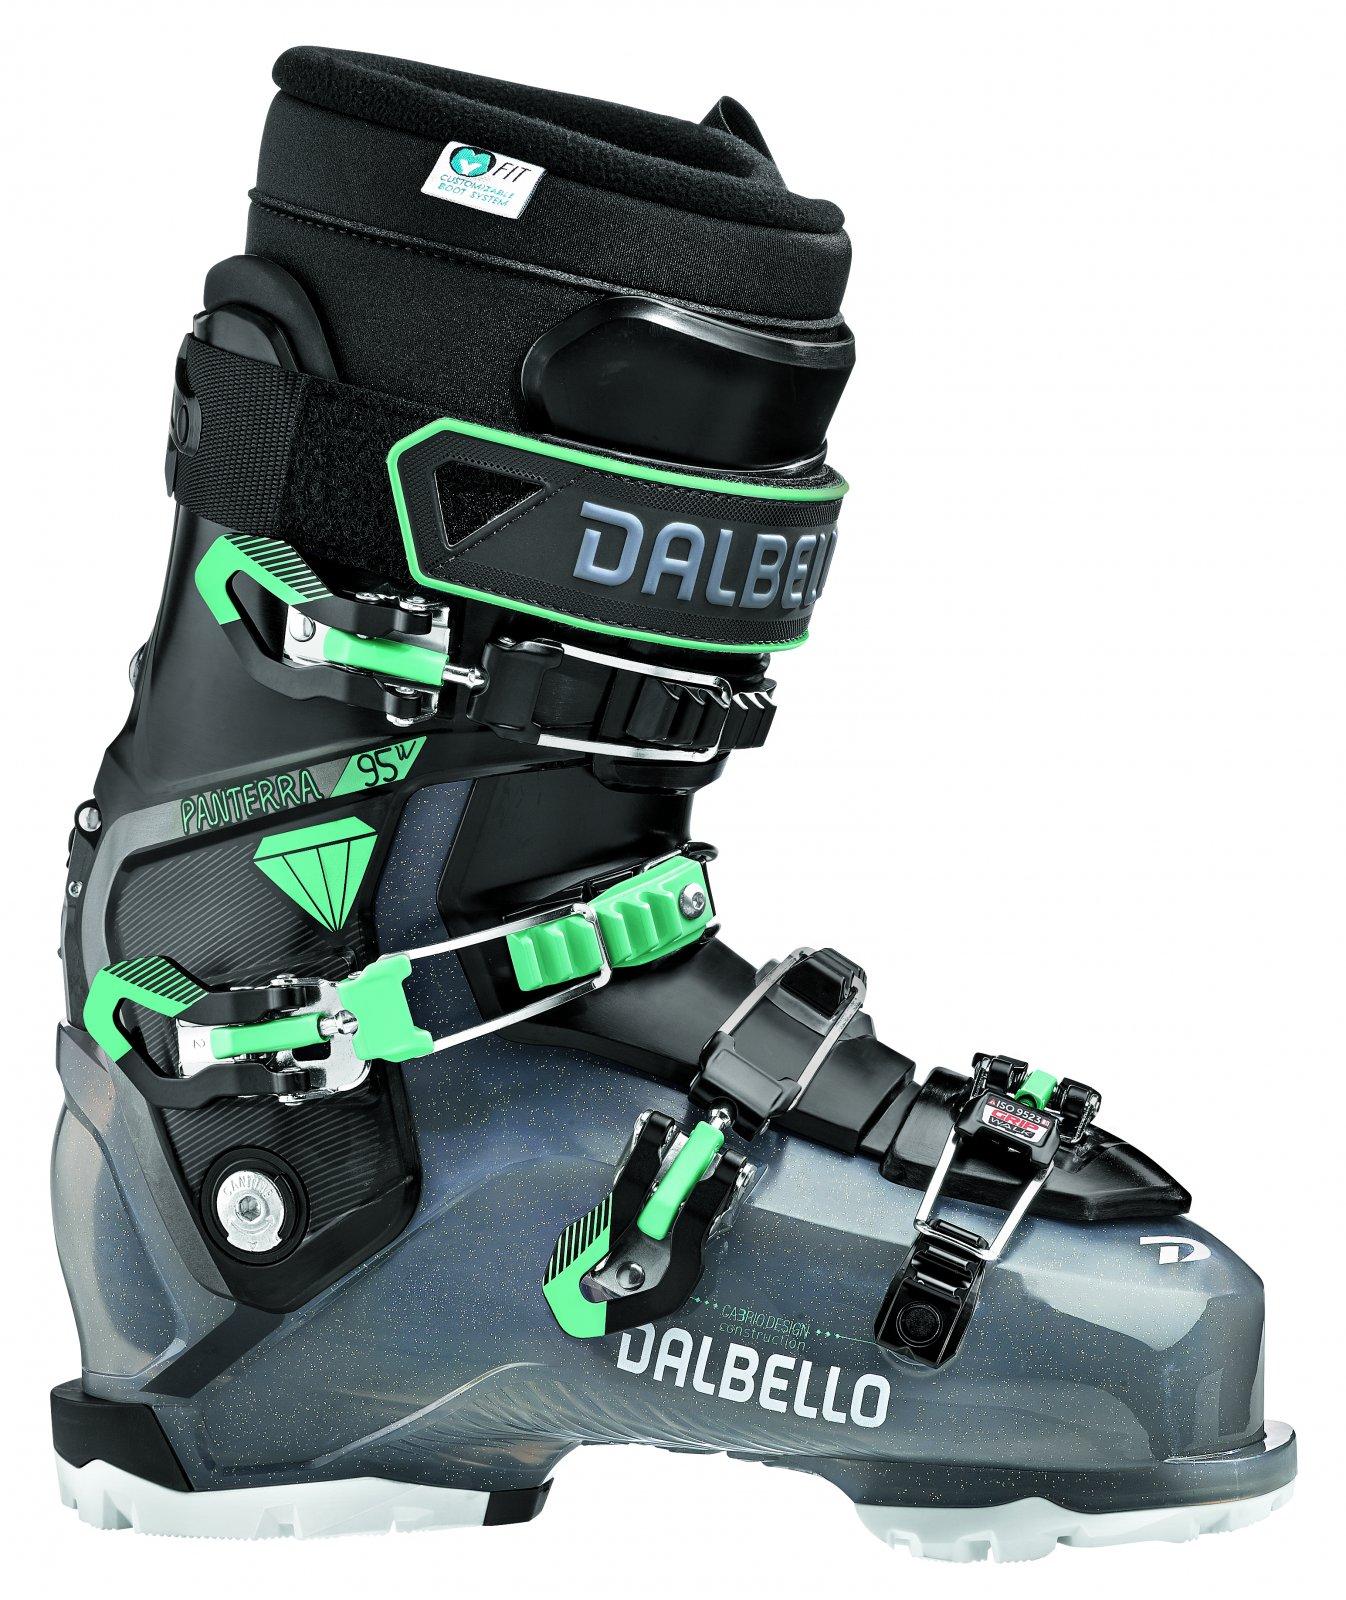 Dalbello Panterra 95 W ID GW Ski Boots 2020